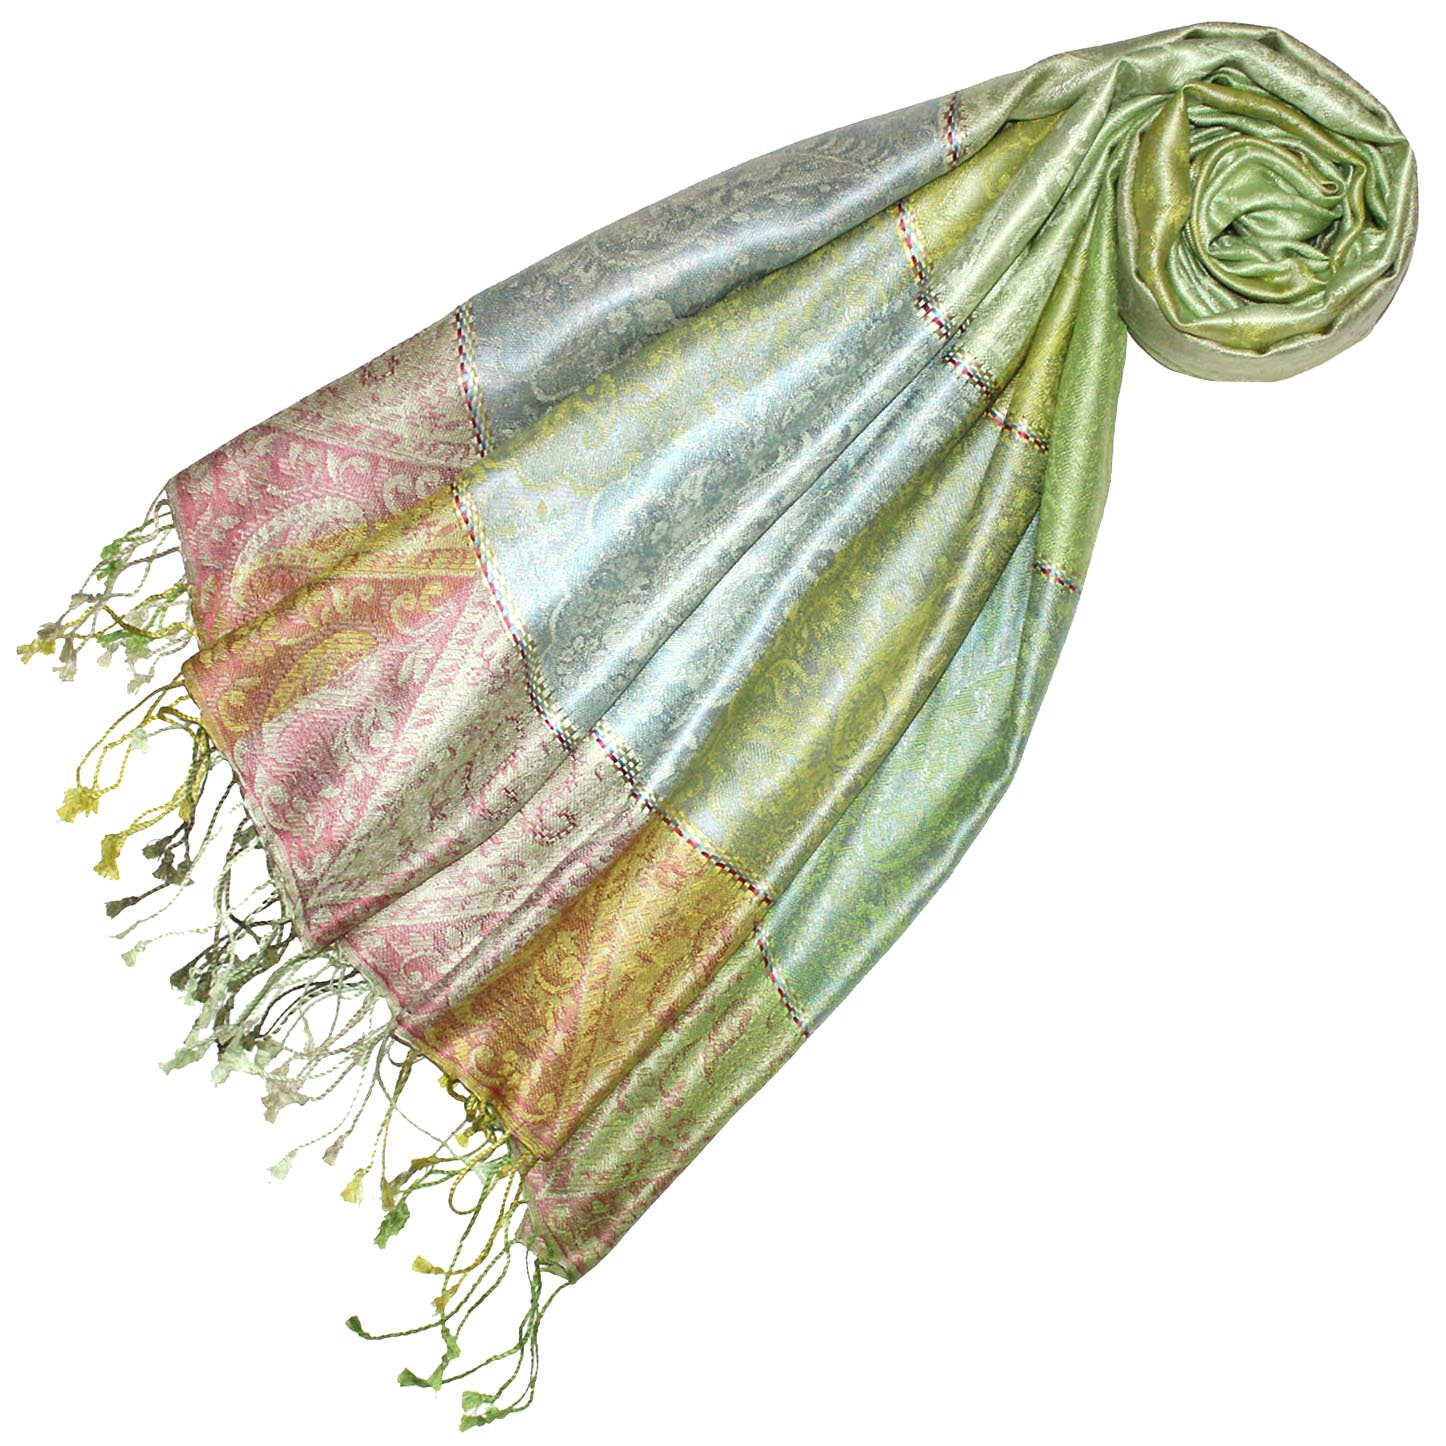 Lorenzo Cana Luxus Pashmina Damen Schal Schaltuch jacquard gewebt 100% Seide 70 cm x 190 cm Paisleymuster Mädchenschal Seidenschal Seidentuch Seidenpashmina harmonische Farben